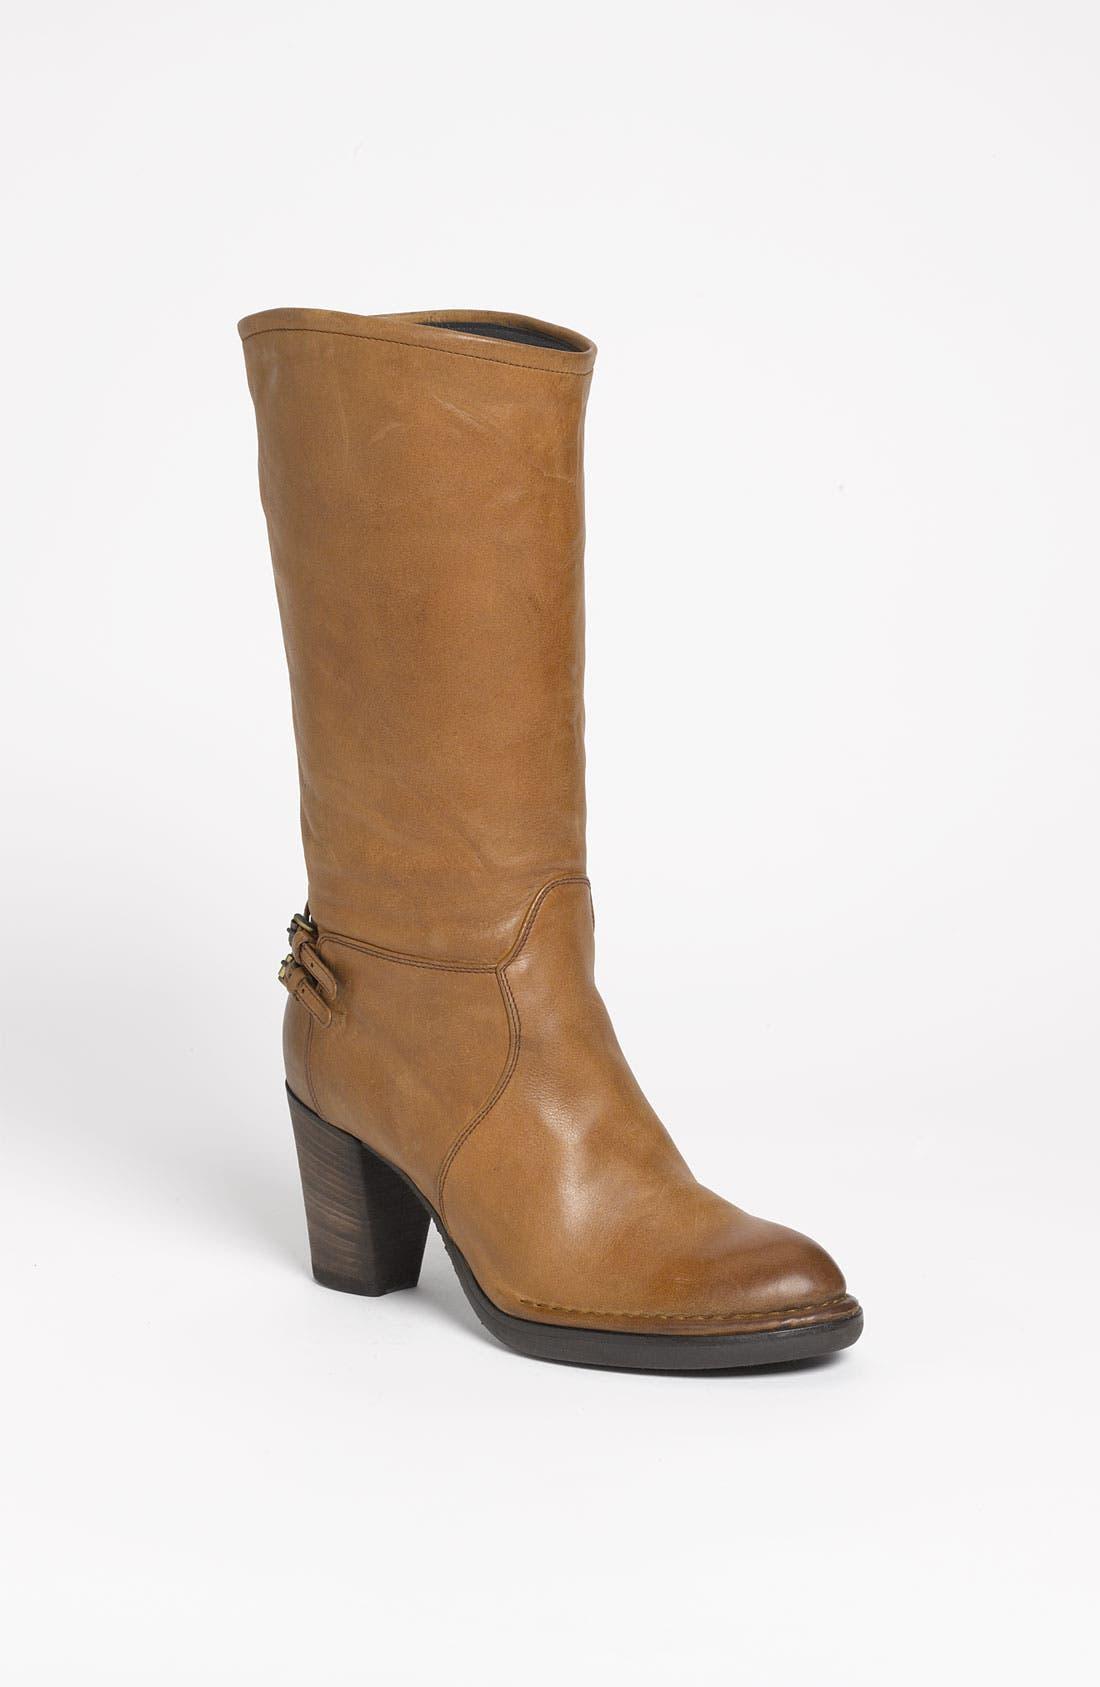 Alternate Image 1 Selected - Alberto Fermani Mid Heel Boot (Nordstrom Exclusive)